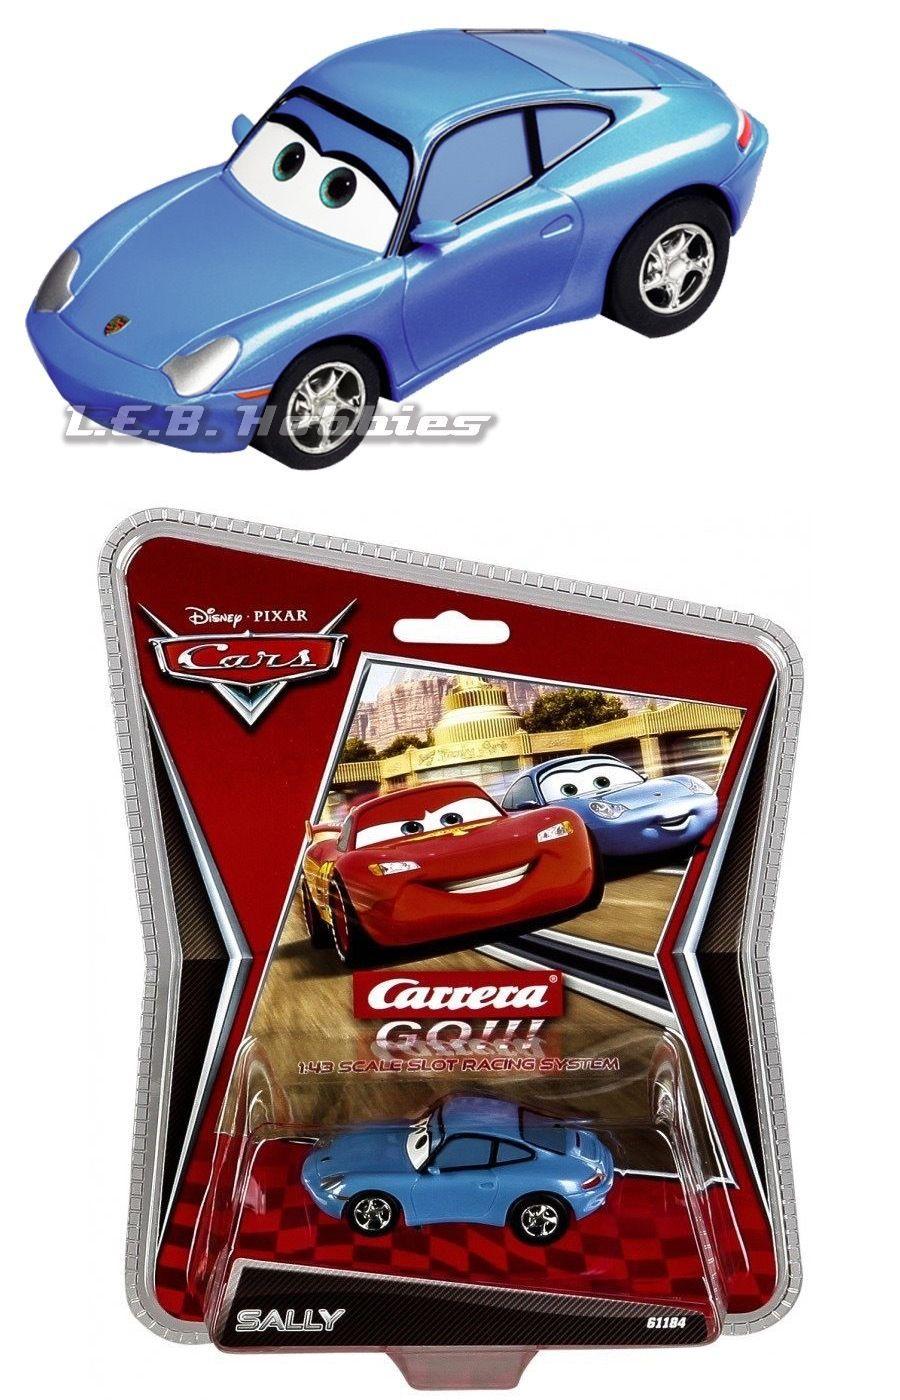 1970 Now 152936 Carrera Go Disney Pixar Cars Sally 1 43 Analog Slot Car 61184 Buy It Now Only 17 99 On Ebay Disney Pixar Cars Disney Cars Cars Movie